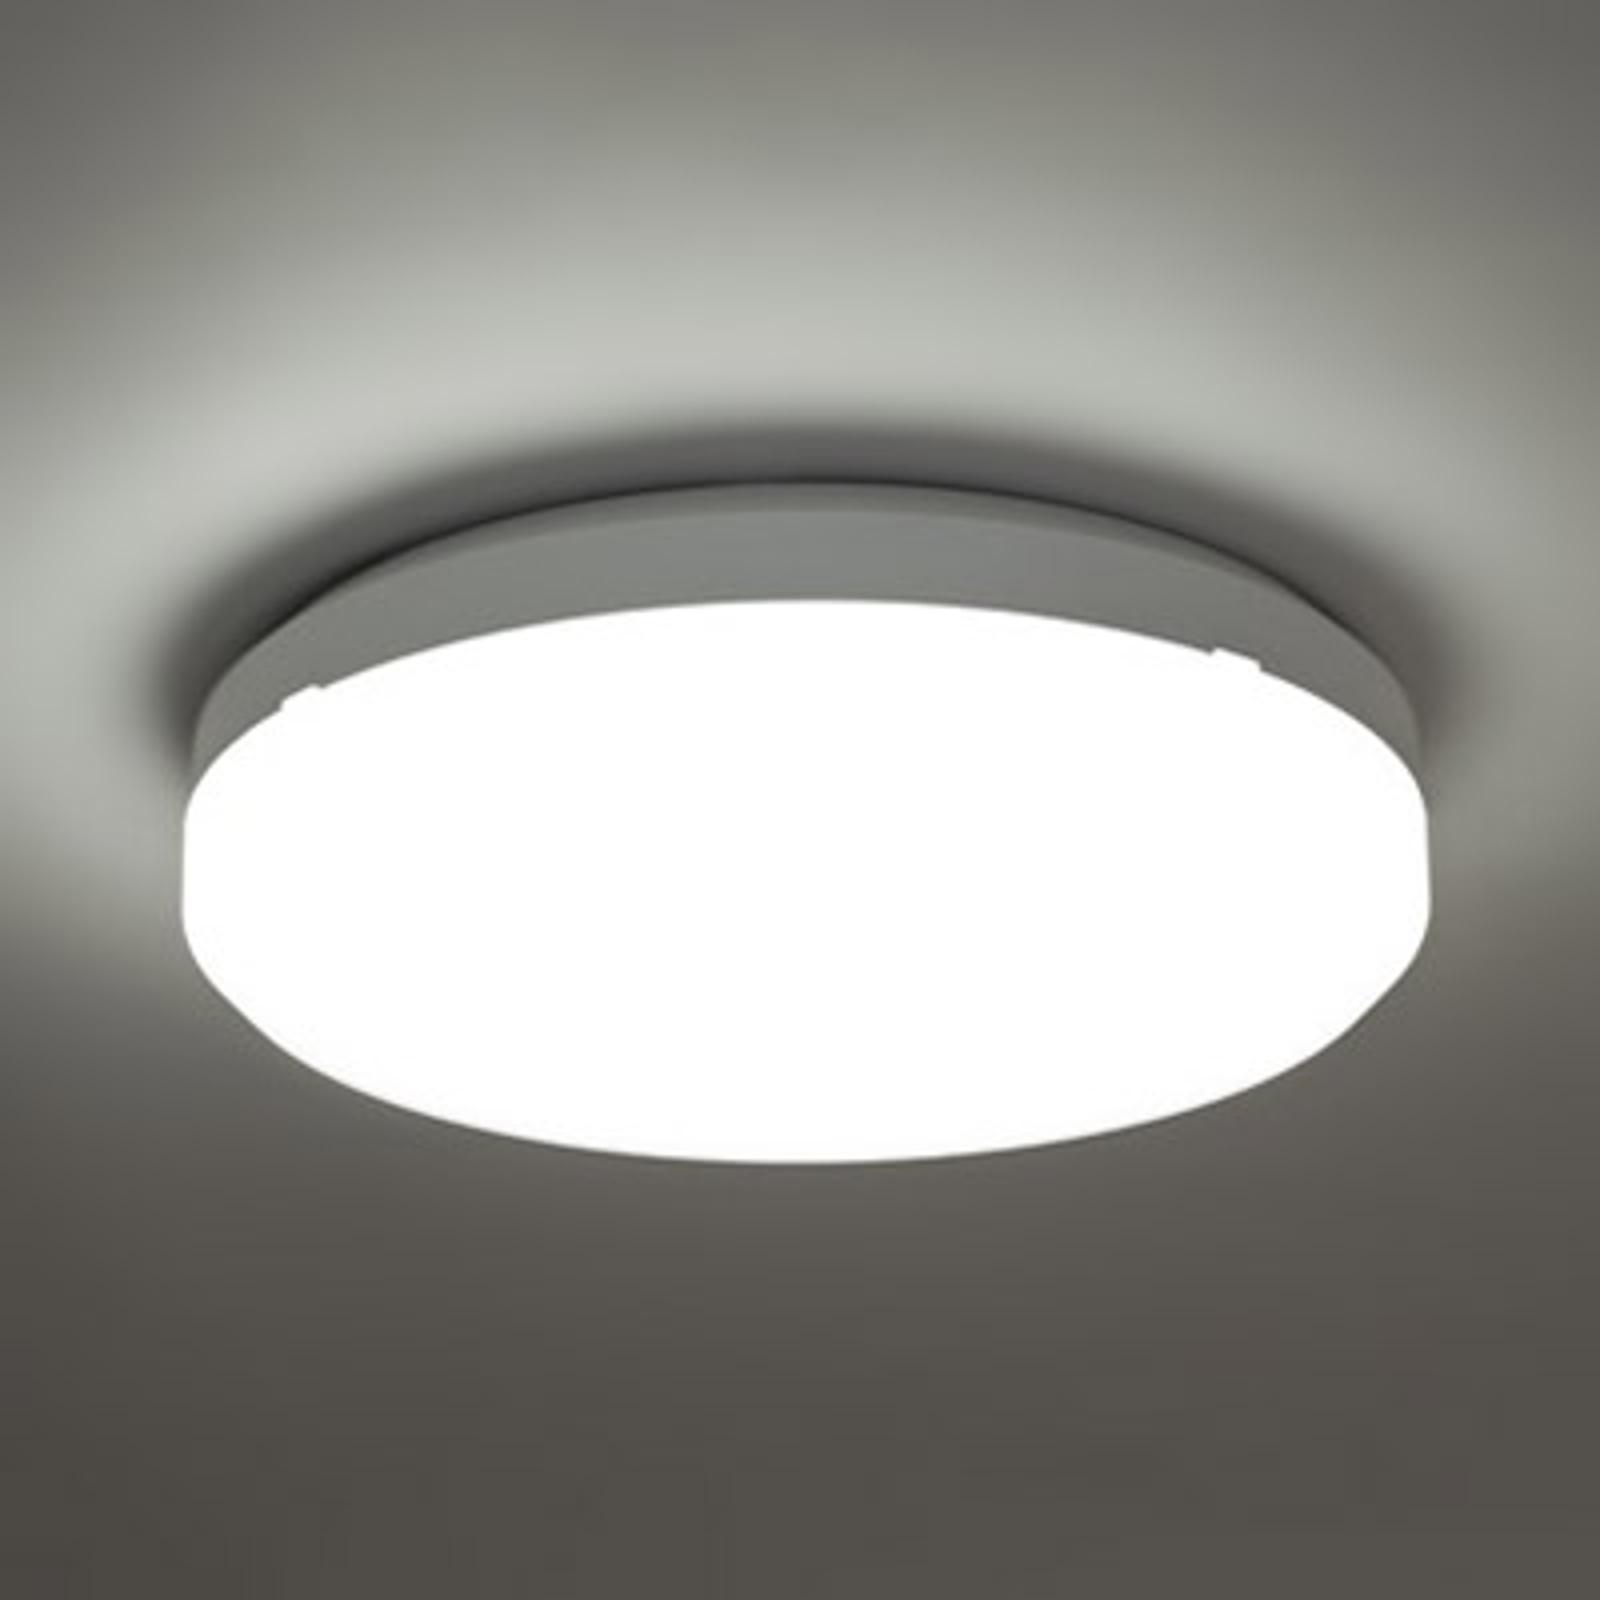 Sun 15 lampa sufitowa LED IP65 26 W 4000K